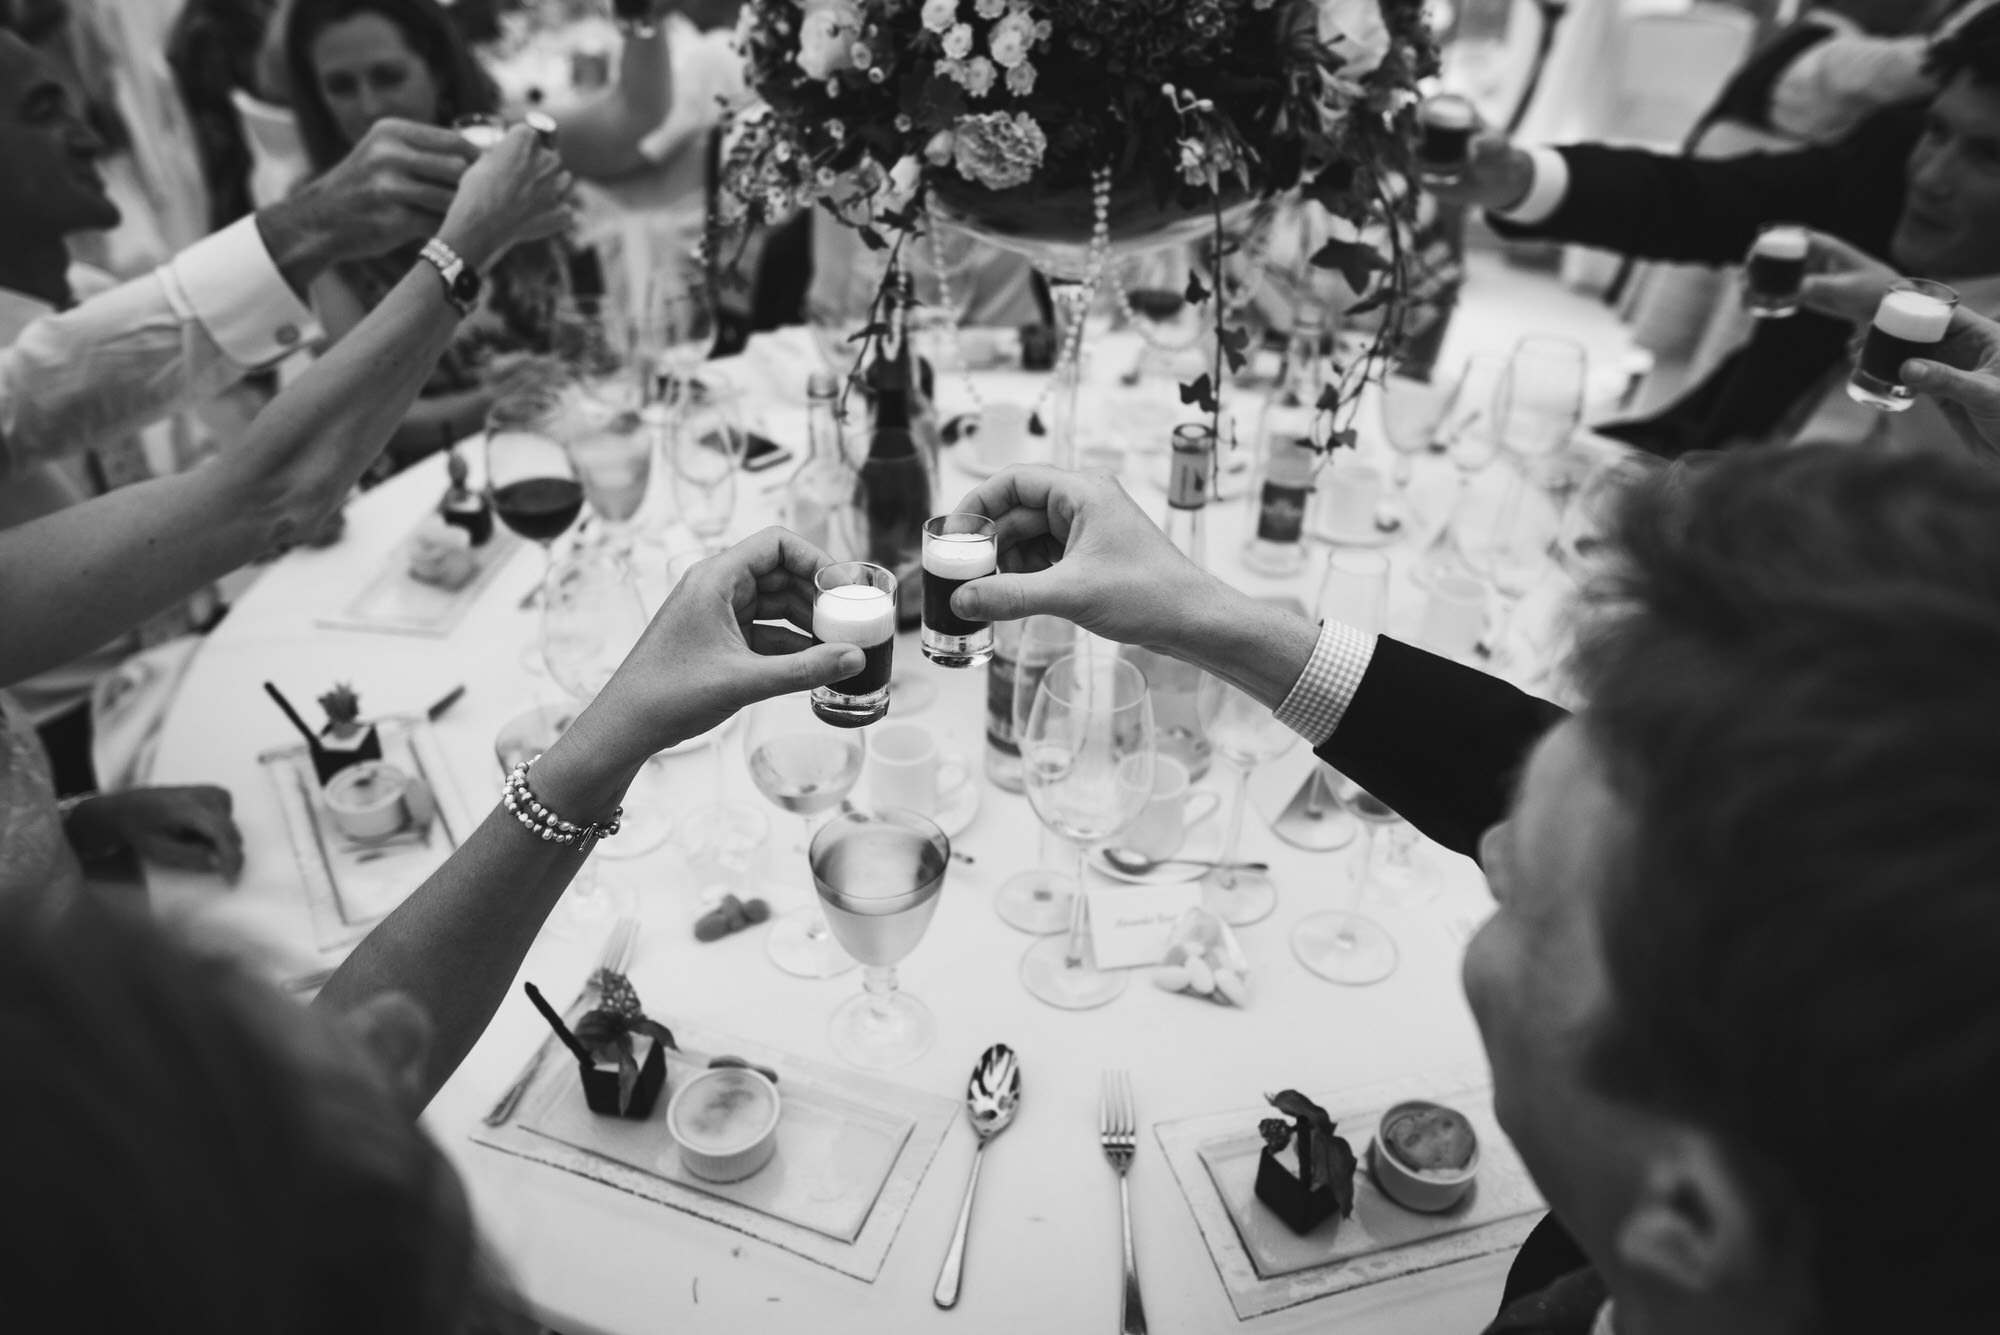 Dorset marquee wedding by the sea simon biffen photography 42